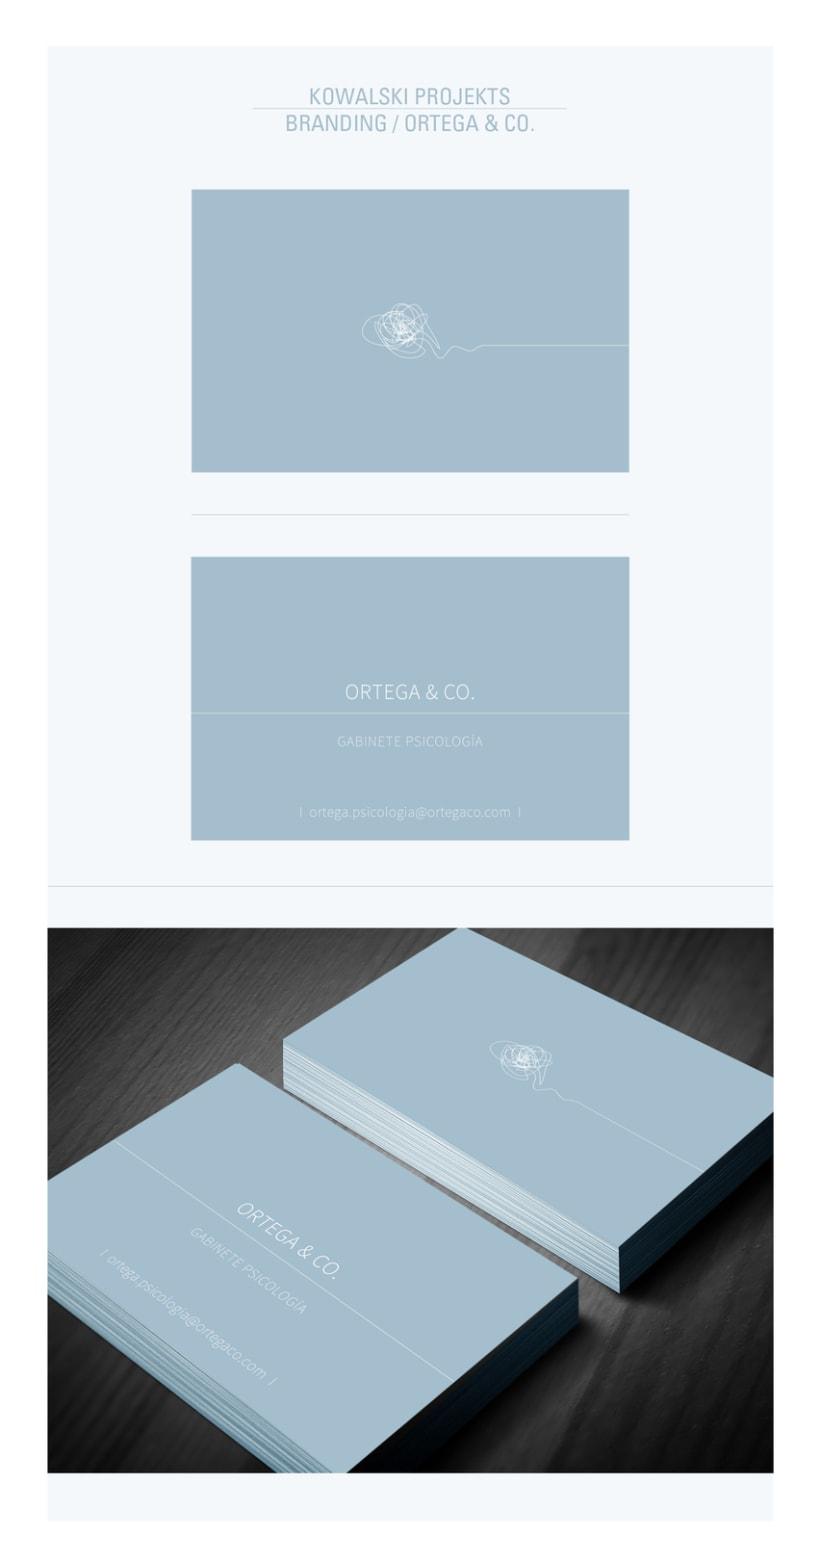 Kowalski Projekts / Branding - ORTEGA & CO - -1